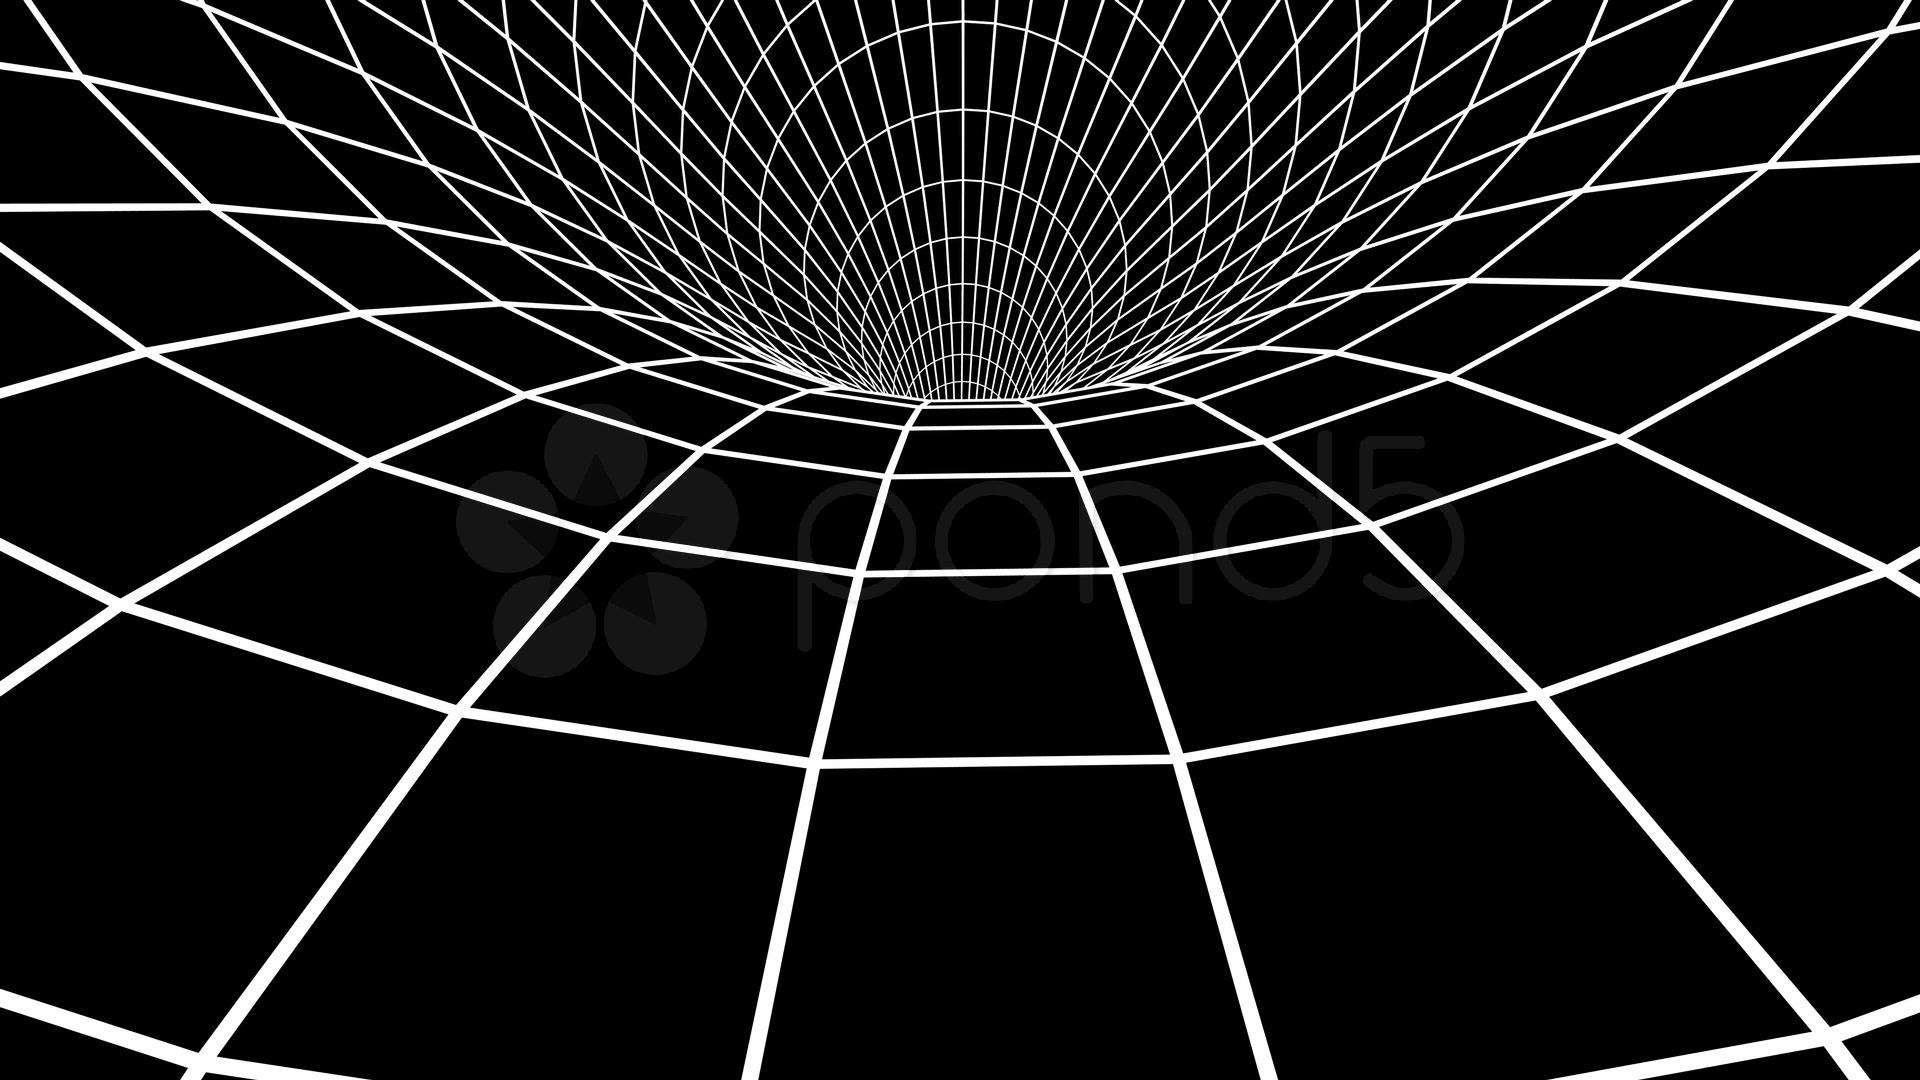 Vortex/wormhole On Black Stock Video 265563   HD Stock Footage